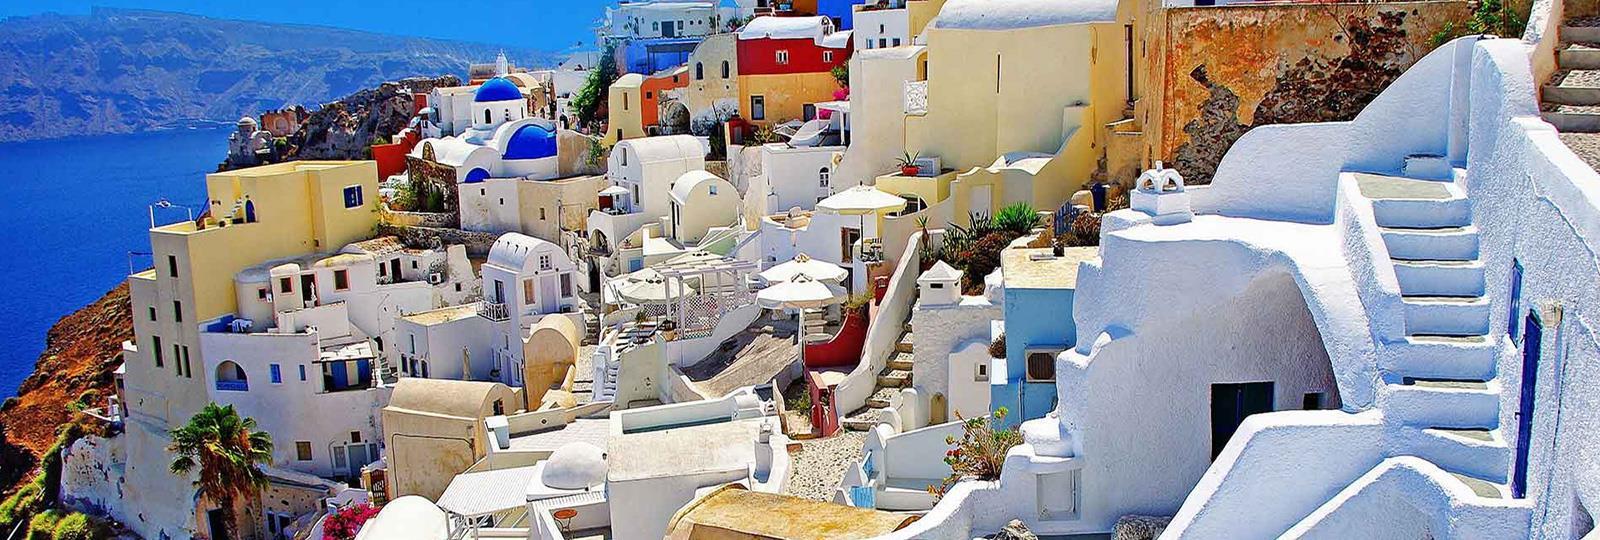 https://travel.ekupi.eu/Images/sliderHorizontal/hoteloffers/Hoteli_pp_1600x540_santorini.jpg